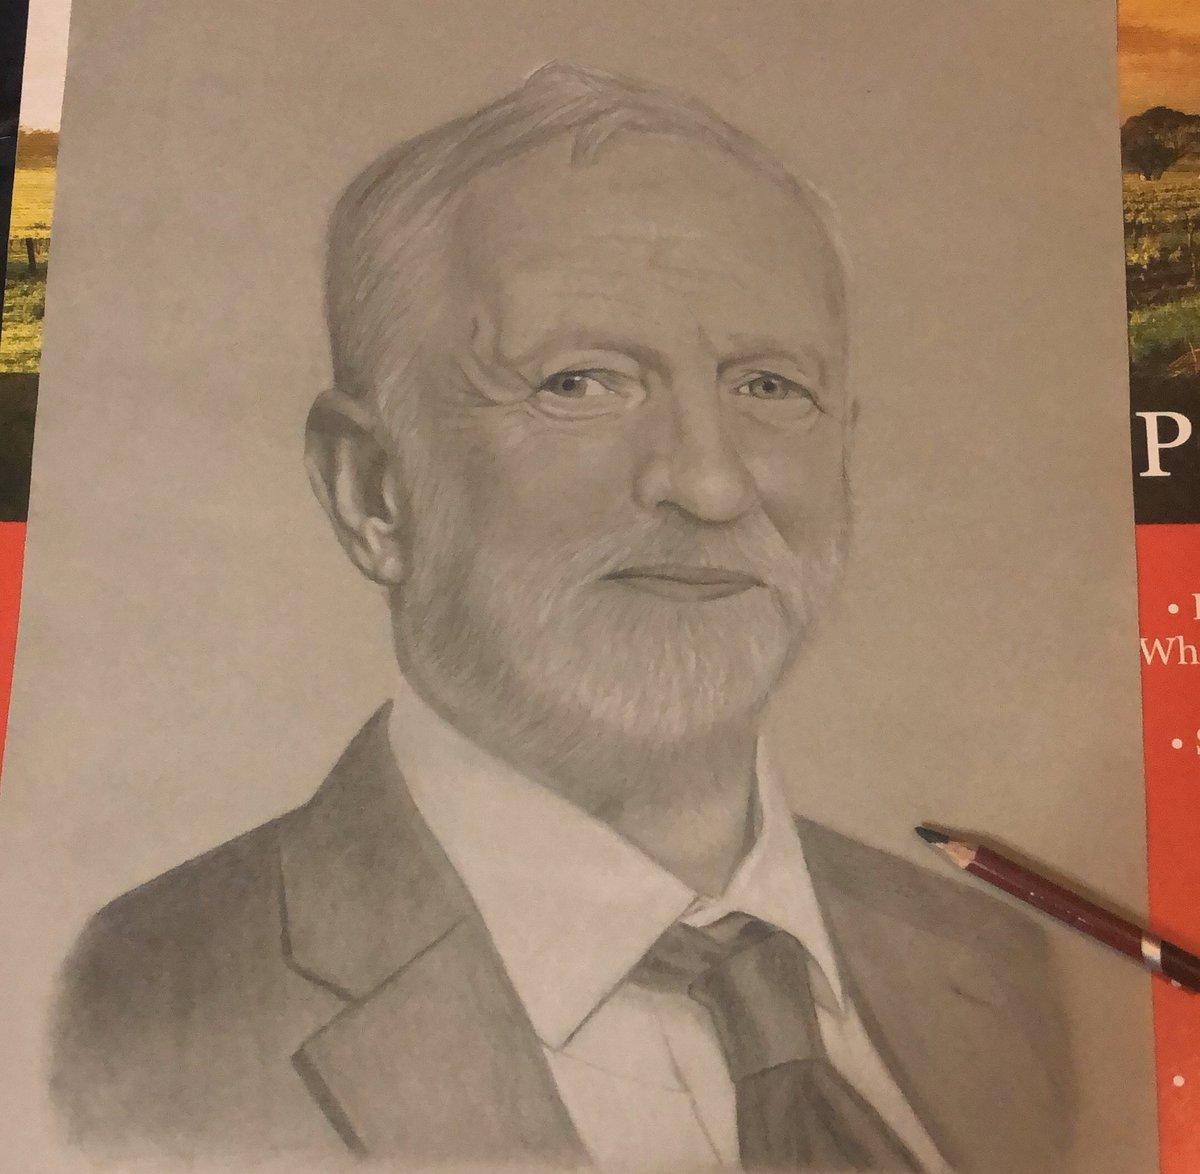 My #workinprogress of our next #PrimeMinister @jeremycorbyn 😎 . #JeremyCorbyn #VoteLabour #JeremyCorbyn4PM #GeneralElection2019 #Art #PoliticalArt #pencildrawing #Artist #JeremyCorbynArt #JC4PM #LabourParty